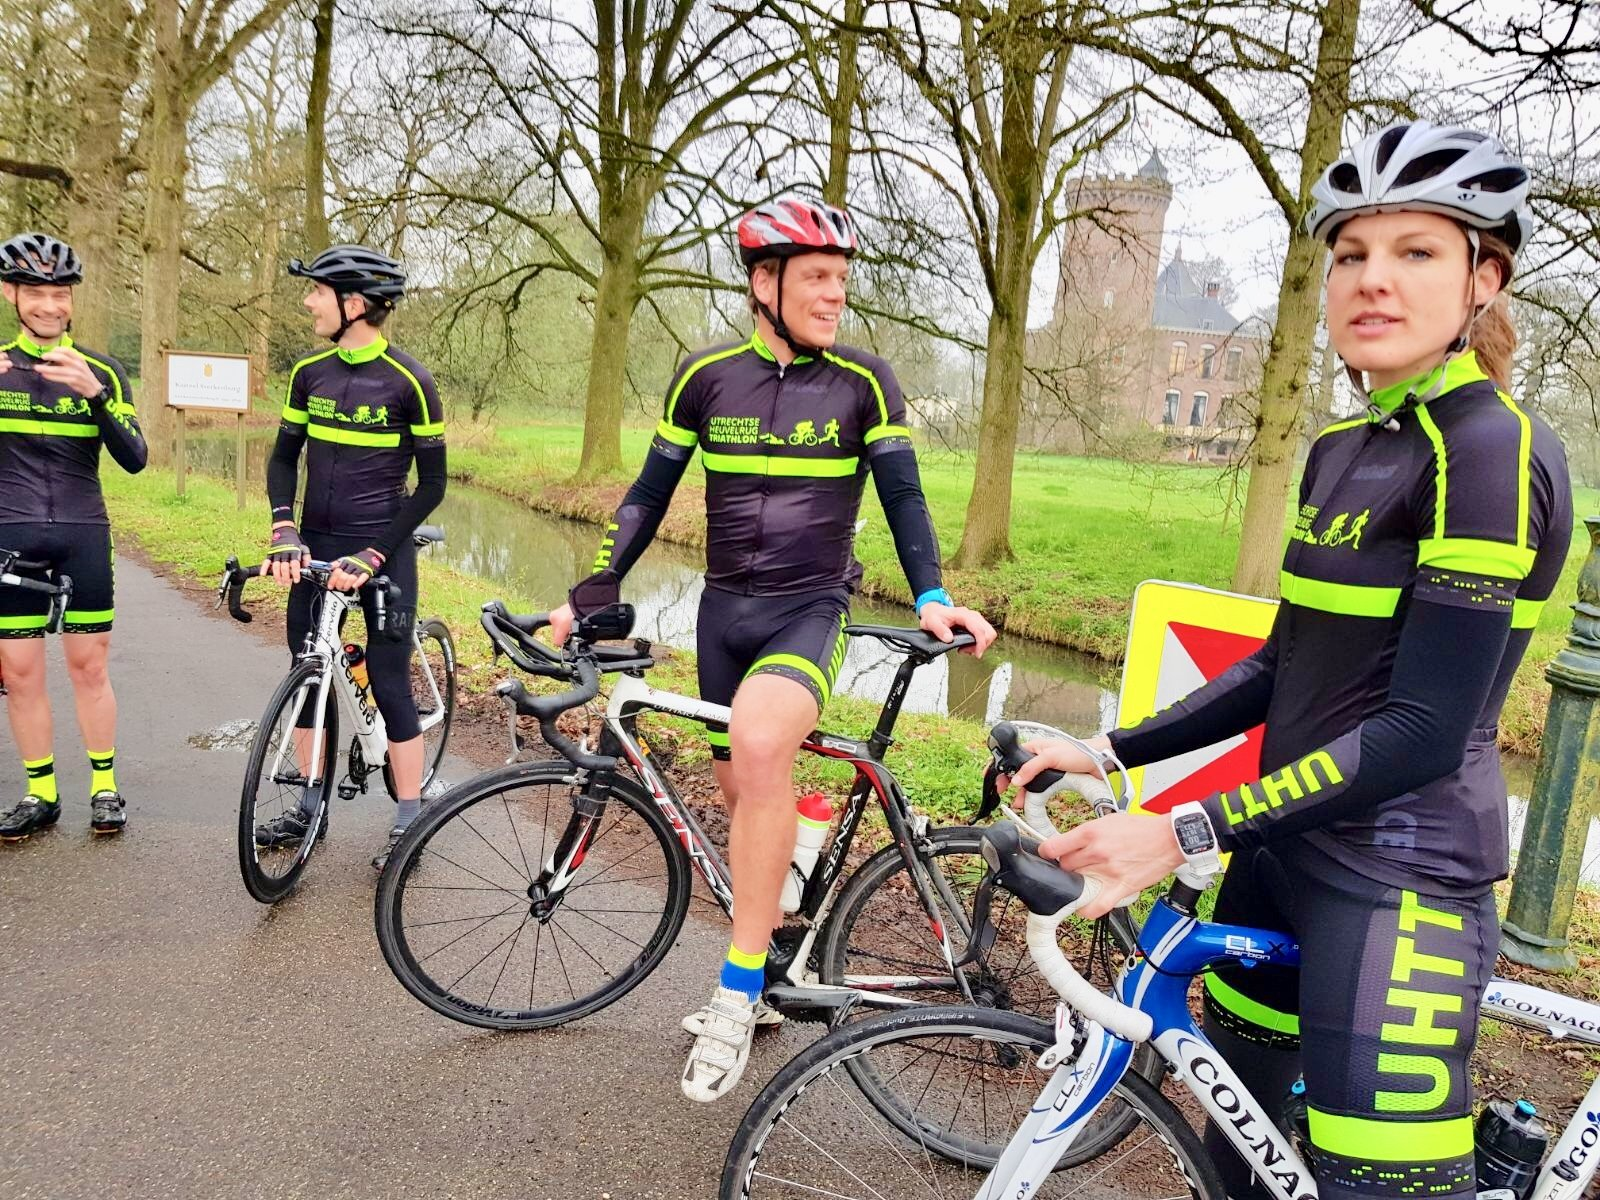 vereniging - UHTT Zomer fietstrainingen - Schema UHTT Lente- en Zomertrainingen bekend - Zwemmen, update, trainen, Planning, Hardlopen, Fietsen, Clinic, Body Boost, Agenda